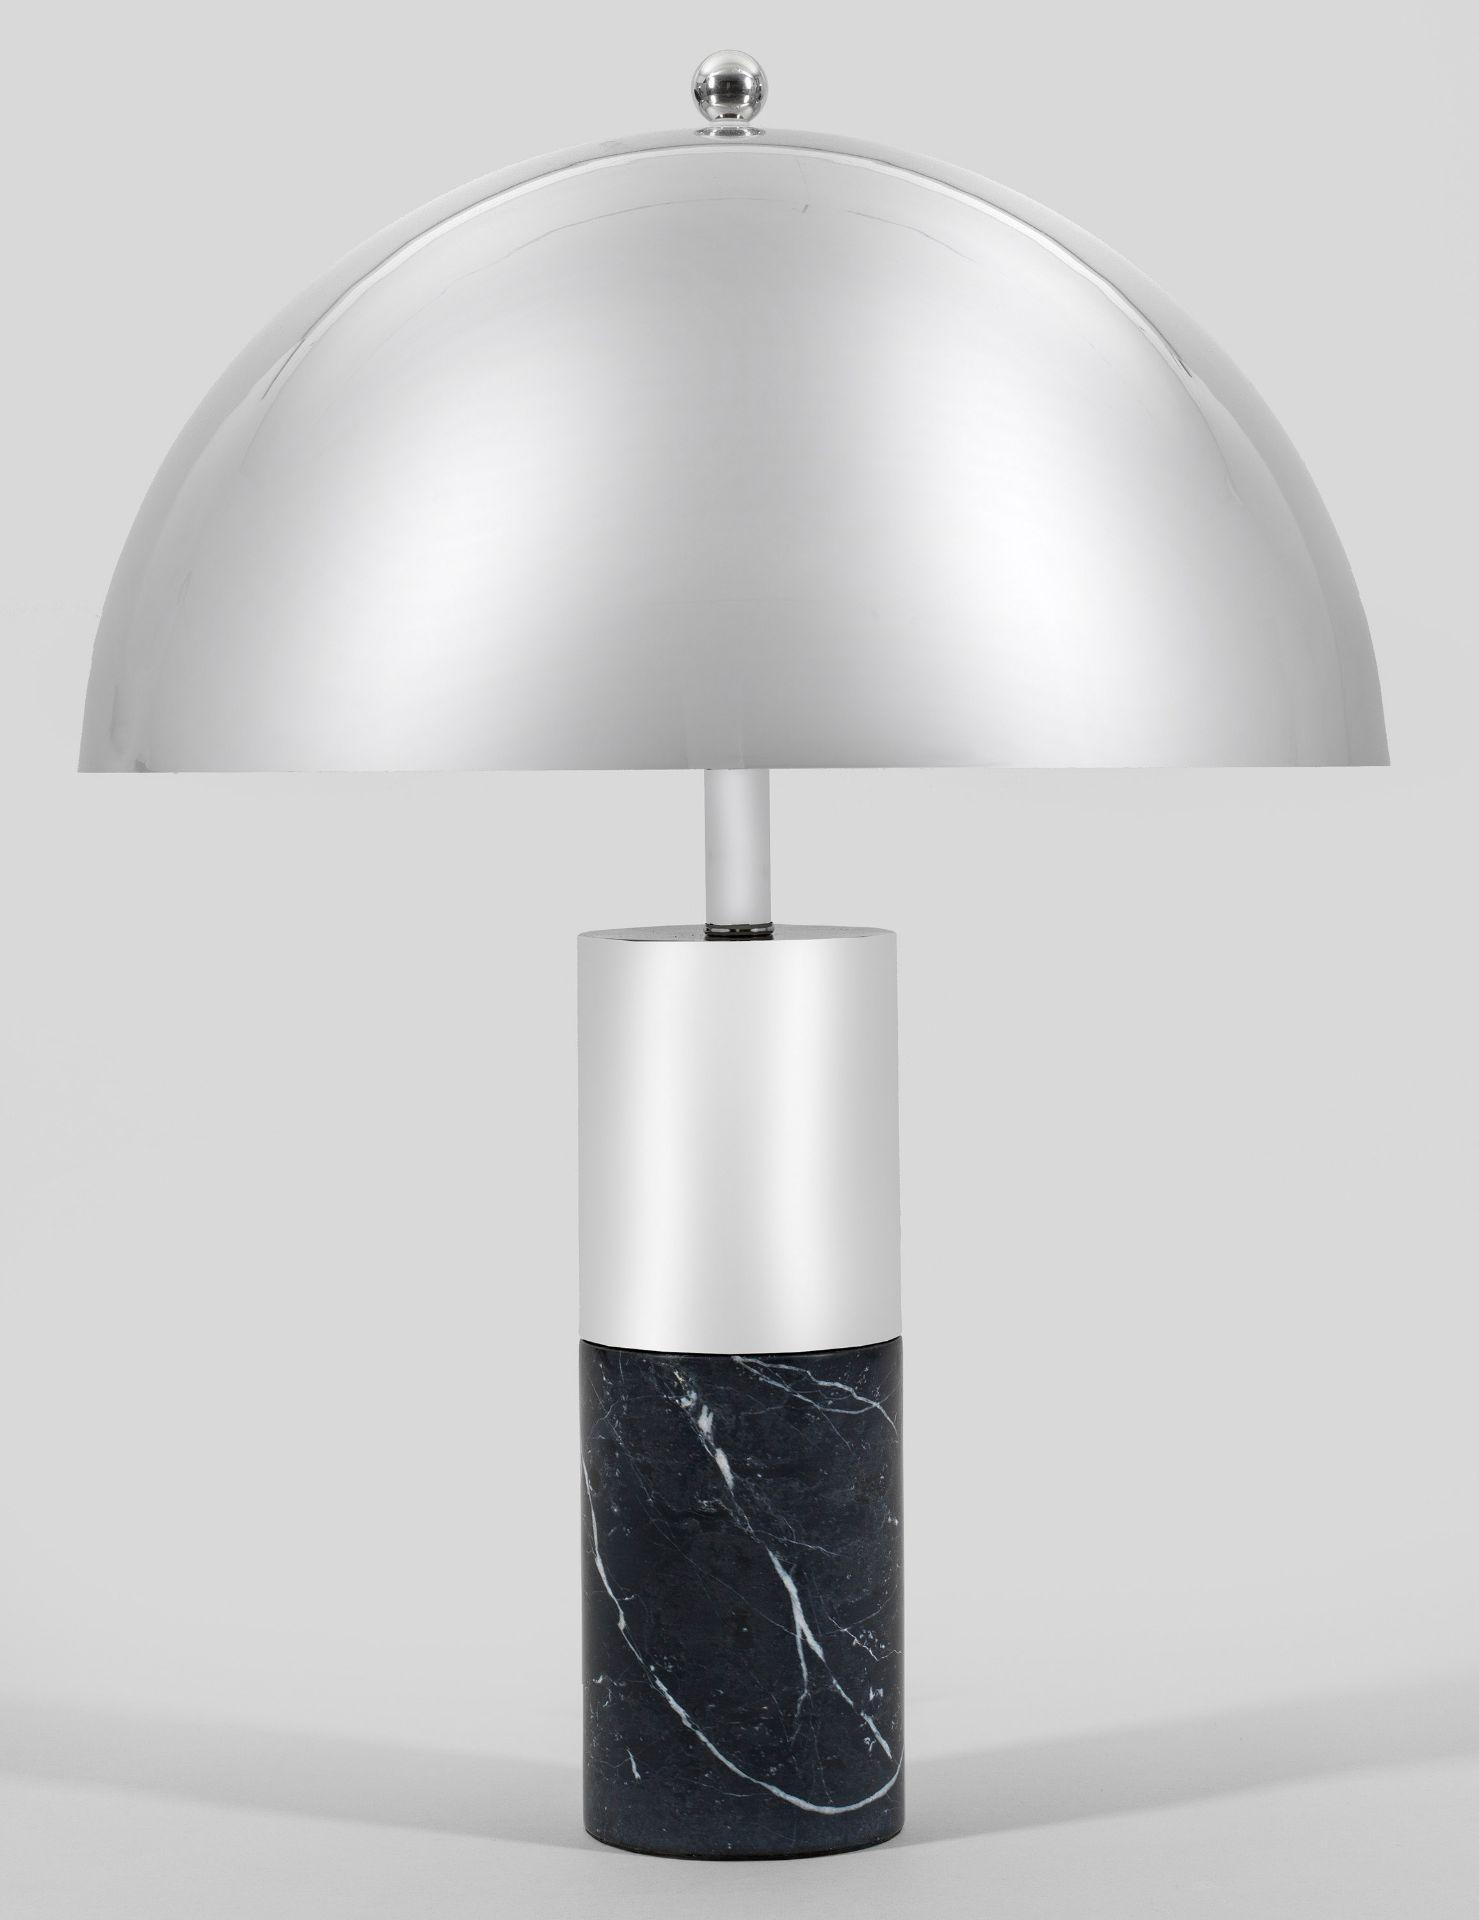 Große Tischlampe